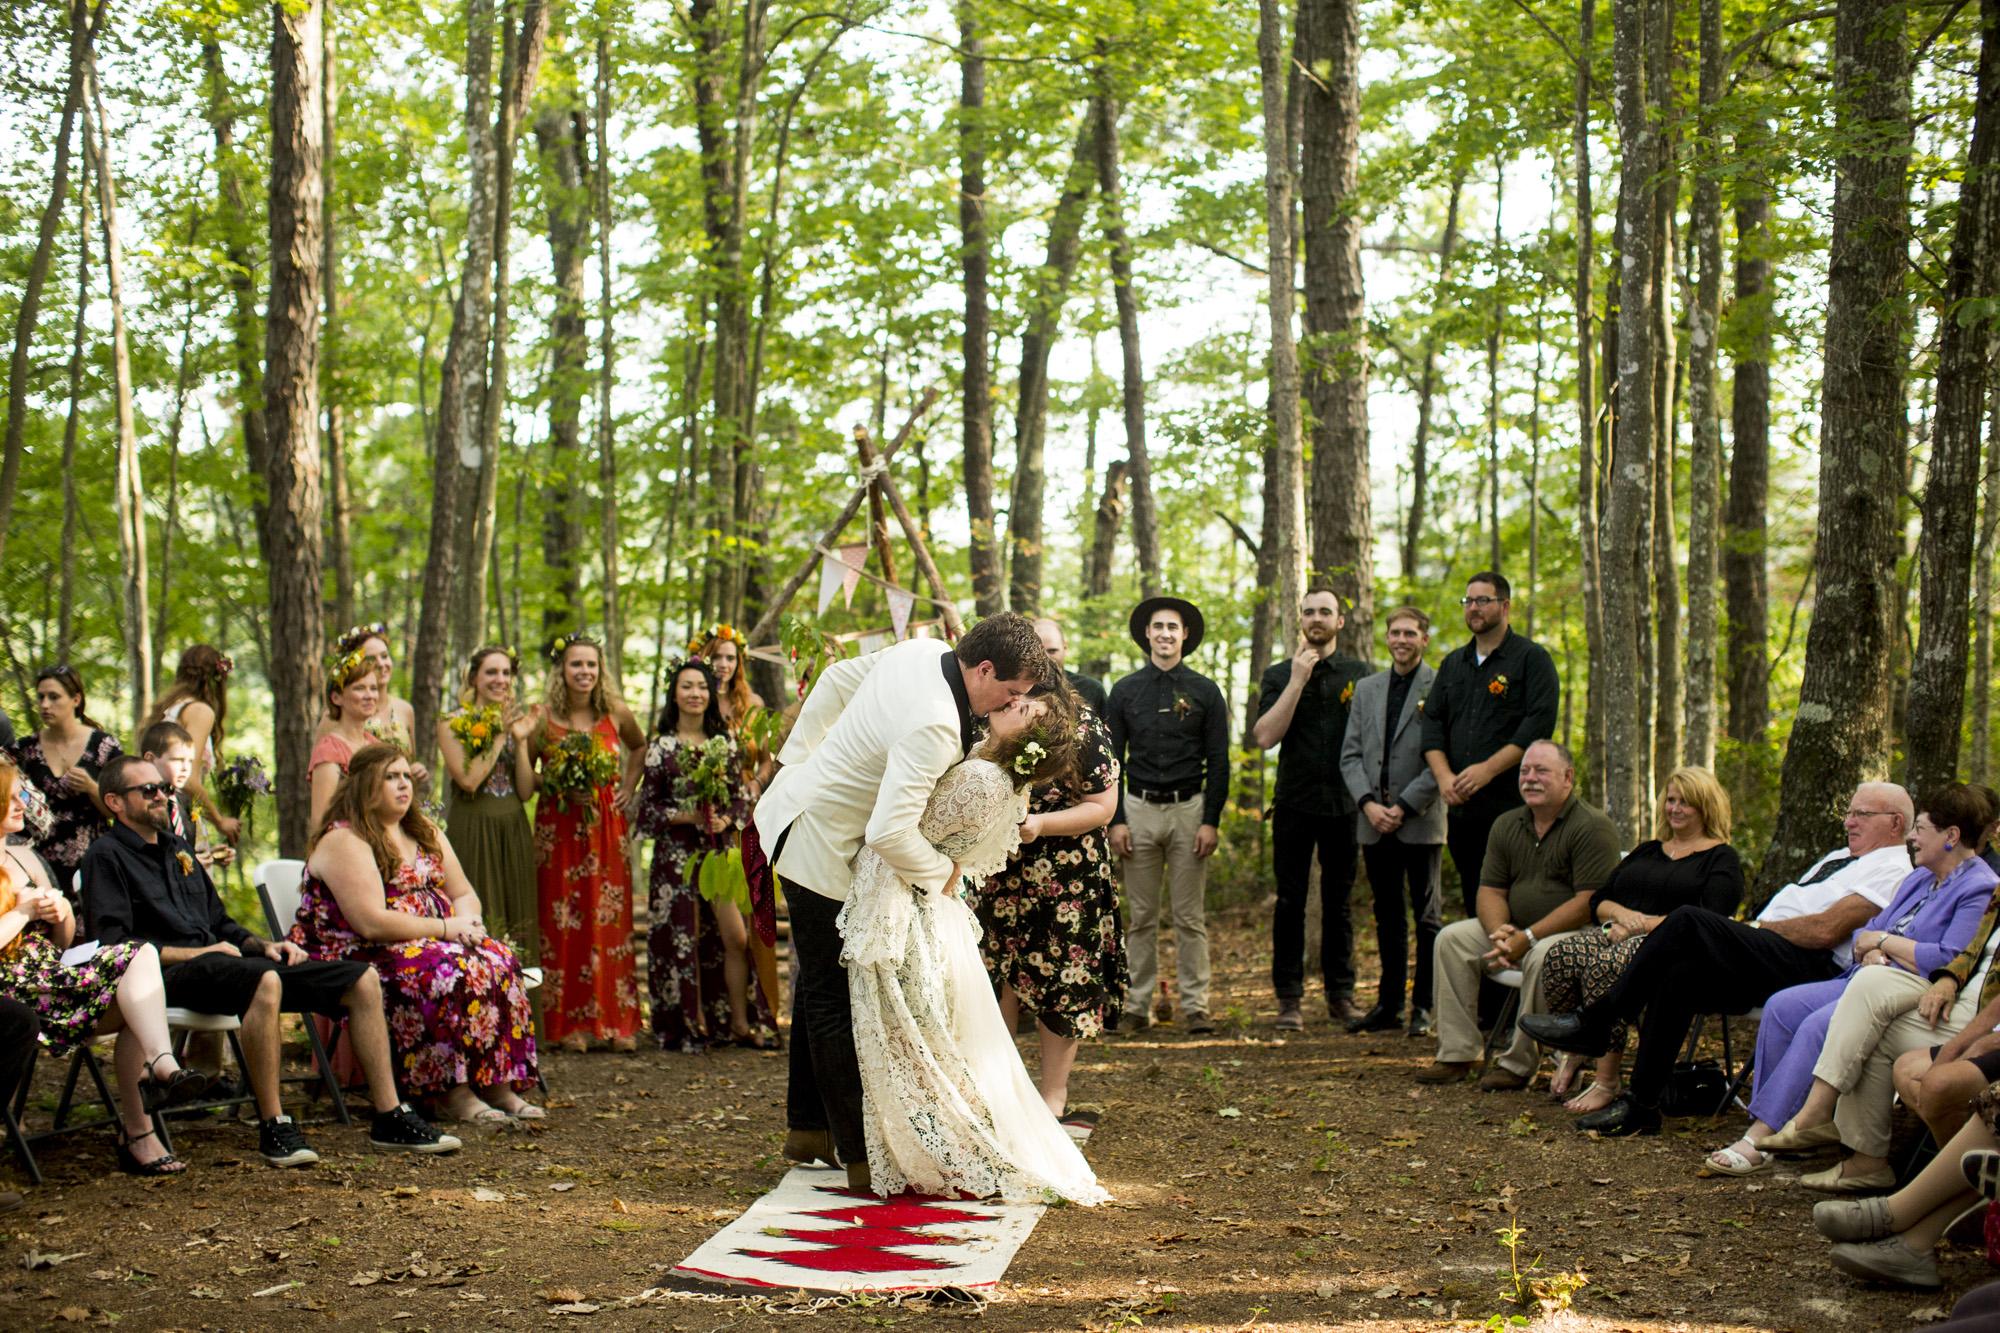 Seriously_Sabrina_Photography_Red_River_Gorge_Kentucky_Wedding_ShawnDana133.jpg